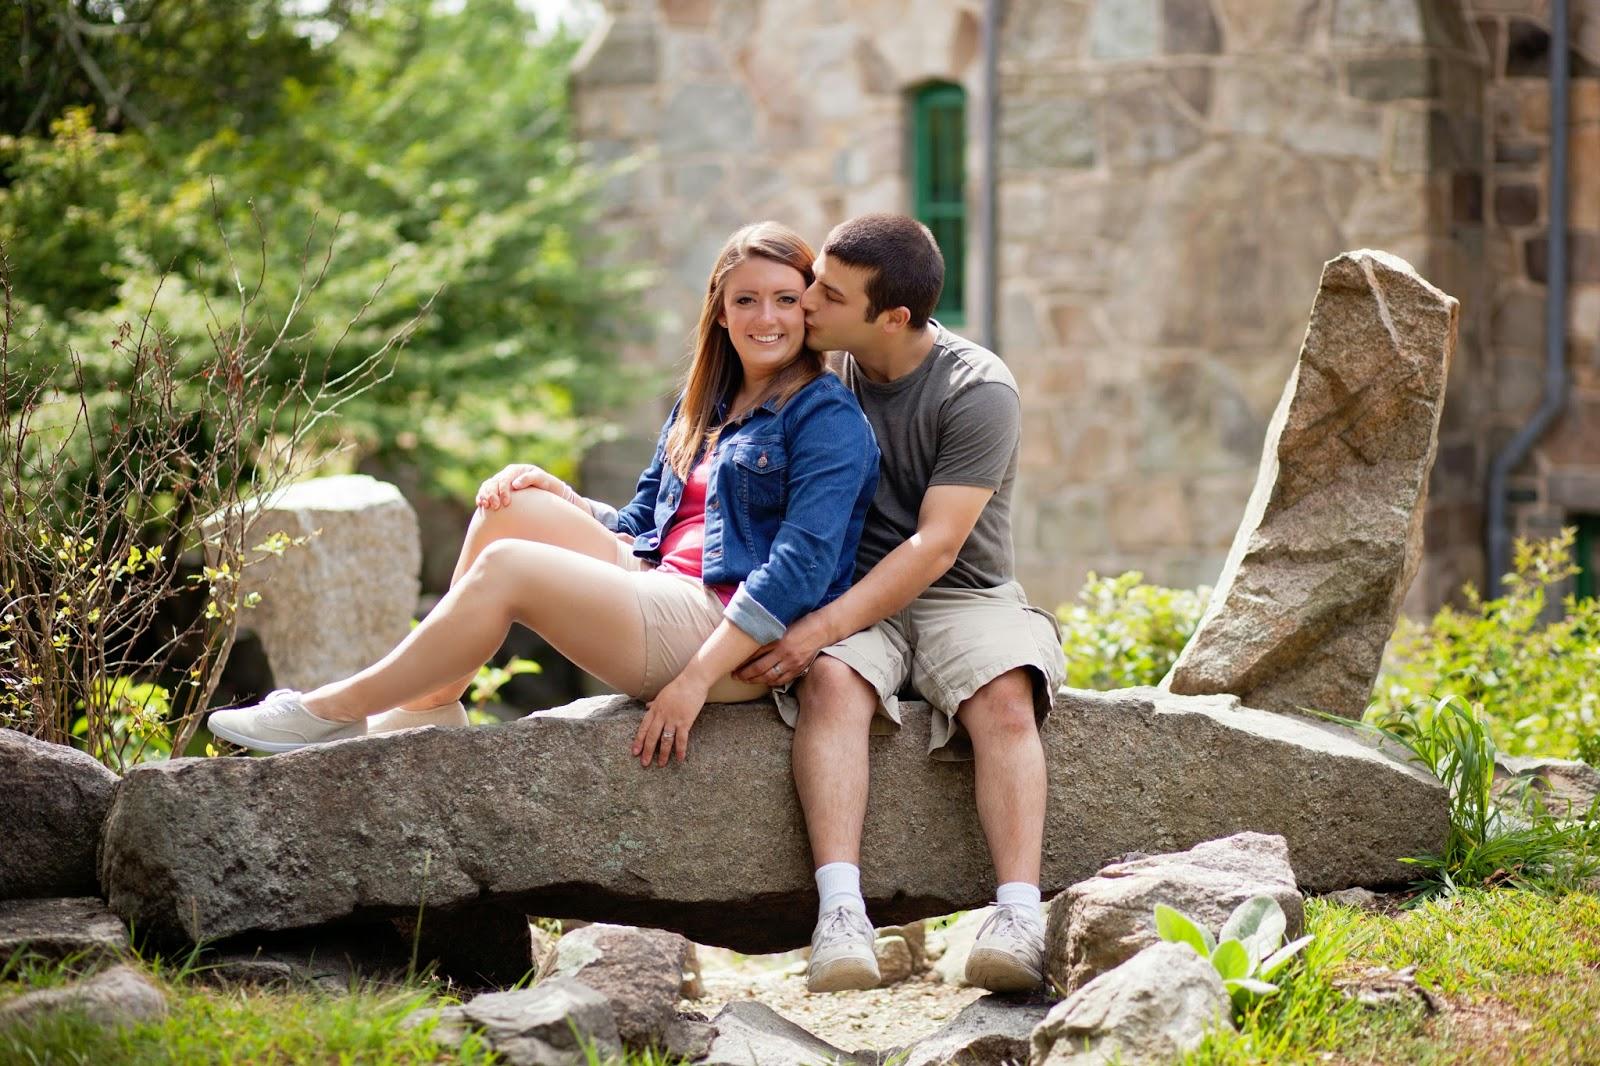 My Love Story: Melissa's Story